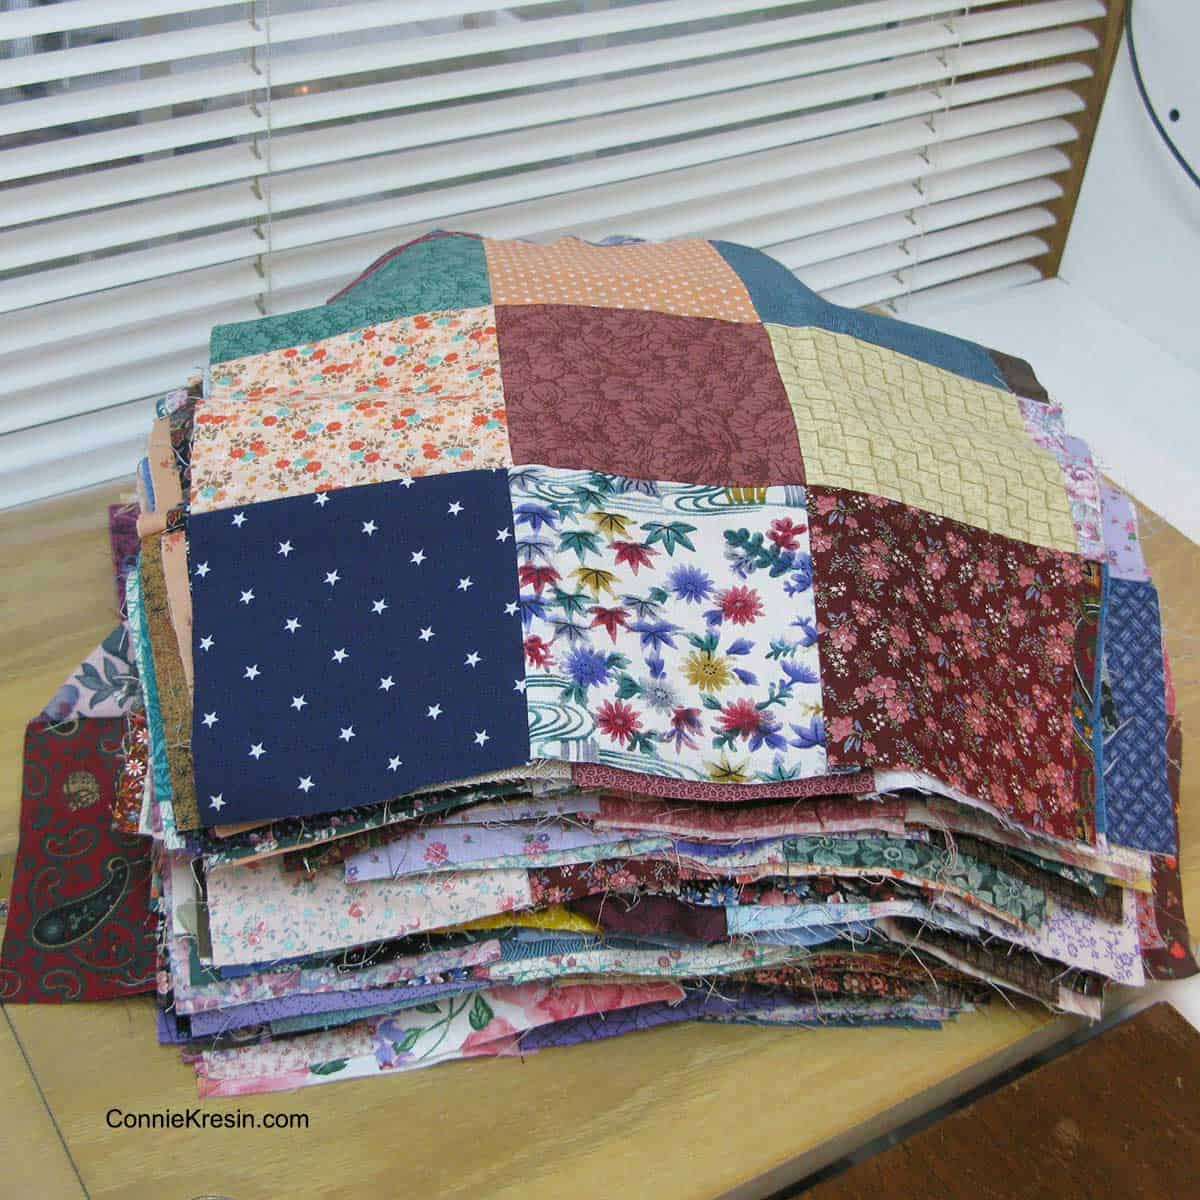 9 patch quilt blocks already pieced